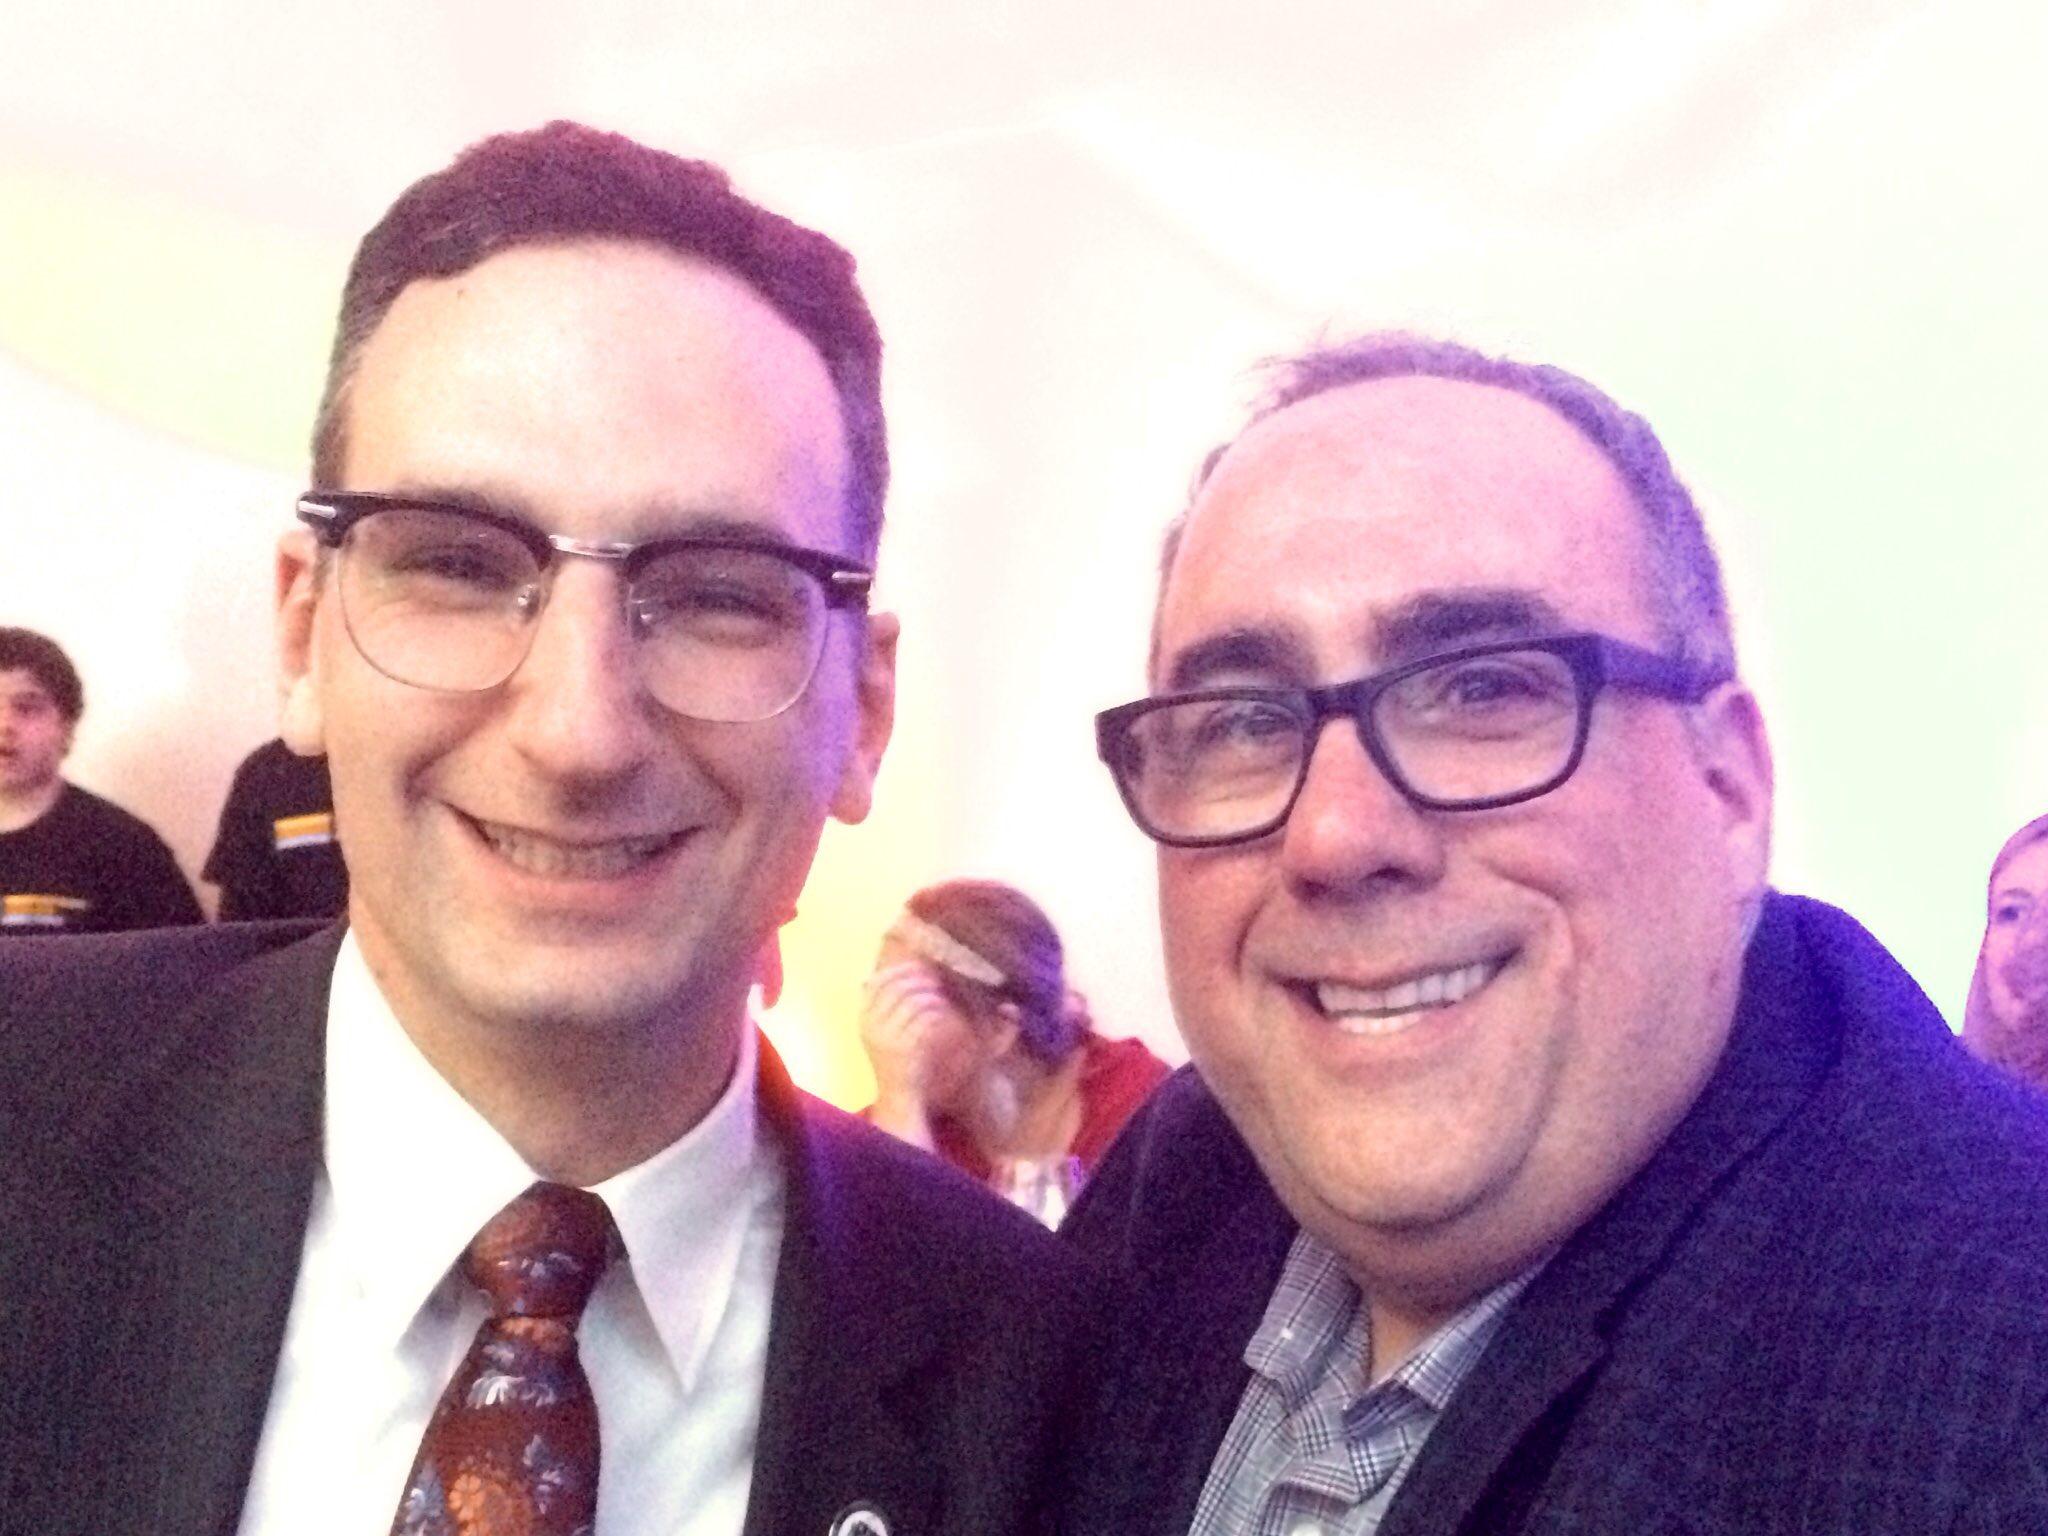 Tommy Vitolo and David Lazowski at the Brookline Teen Center gala